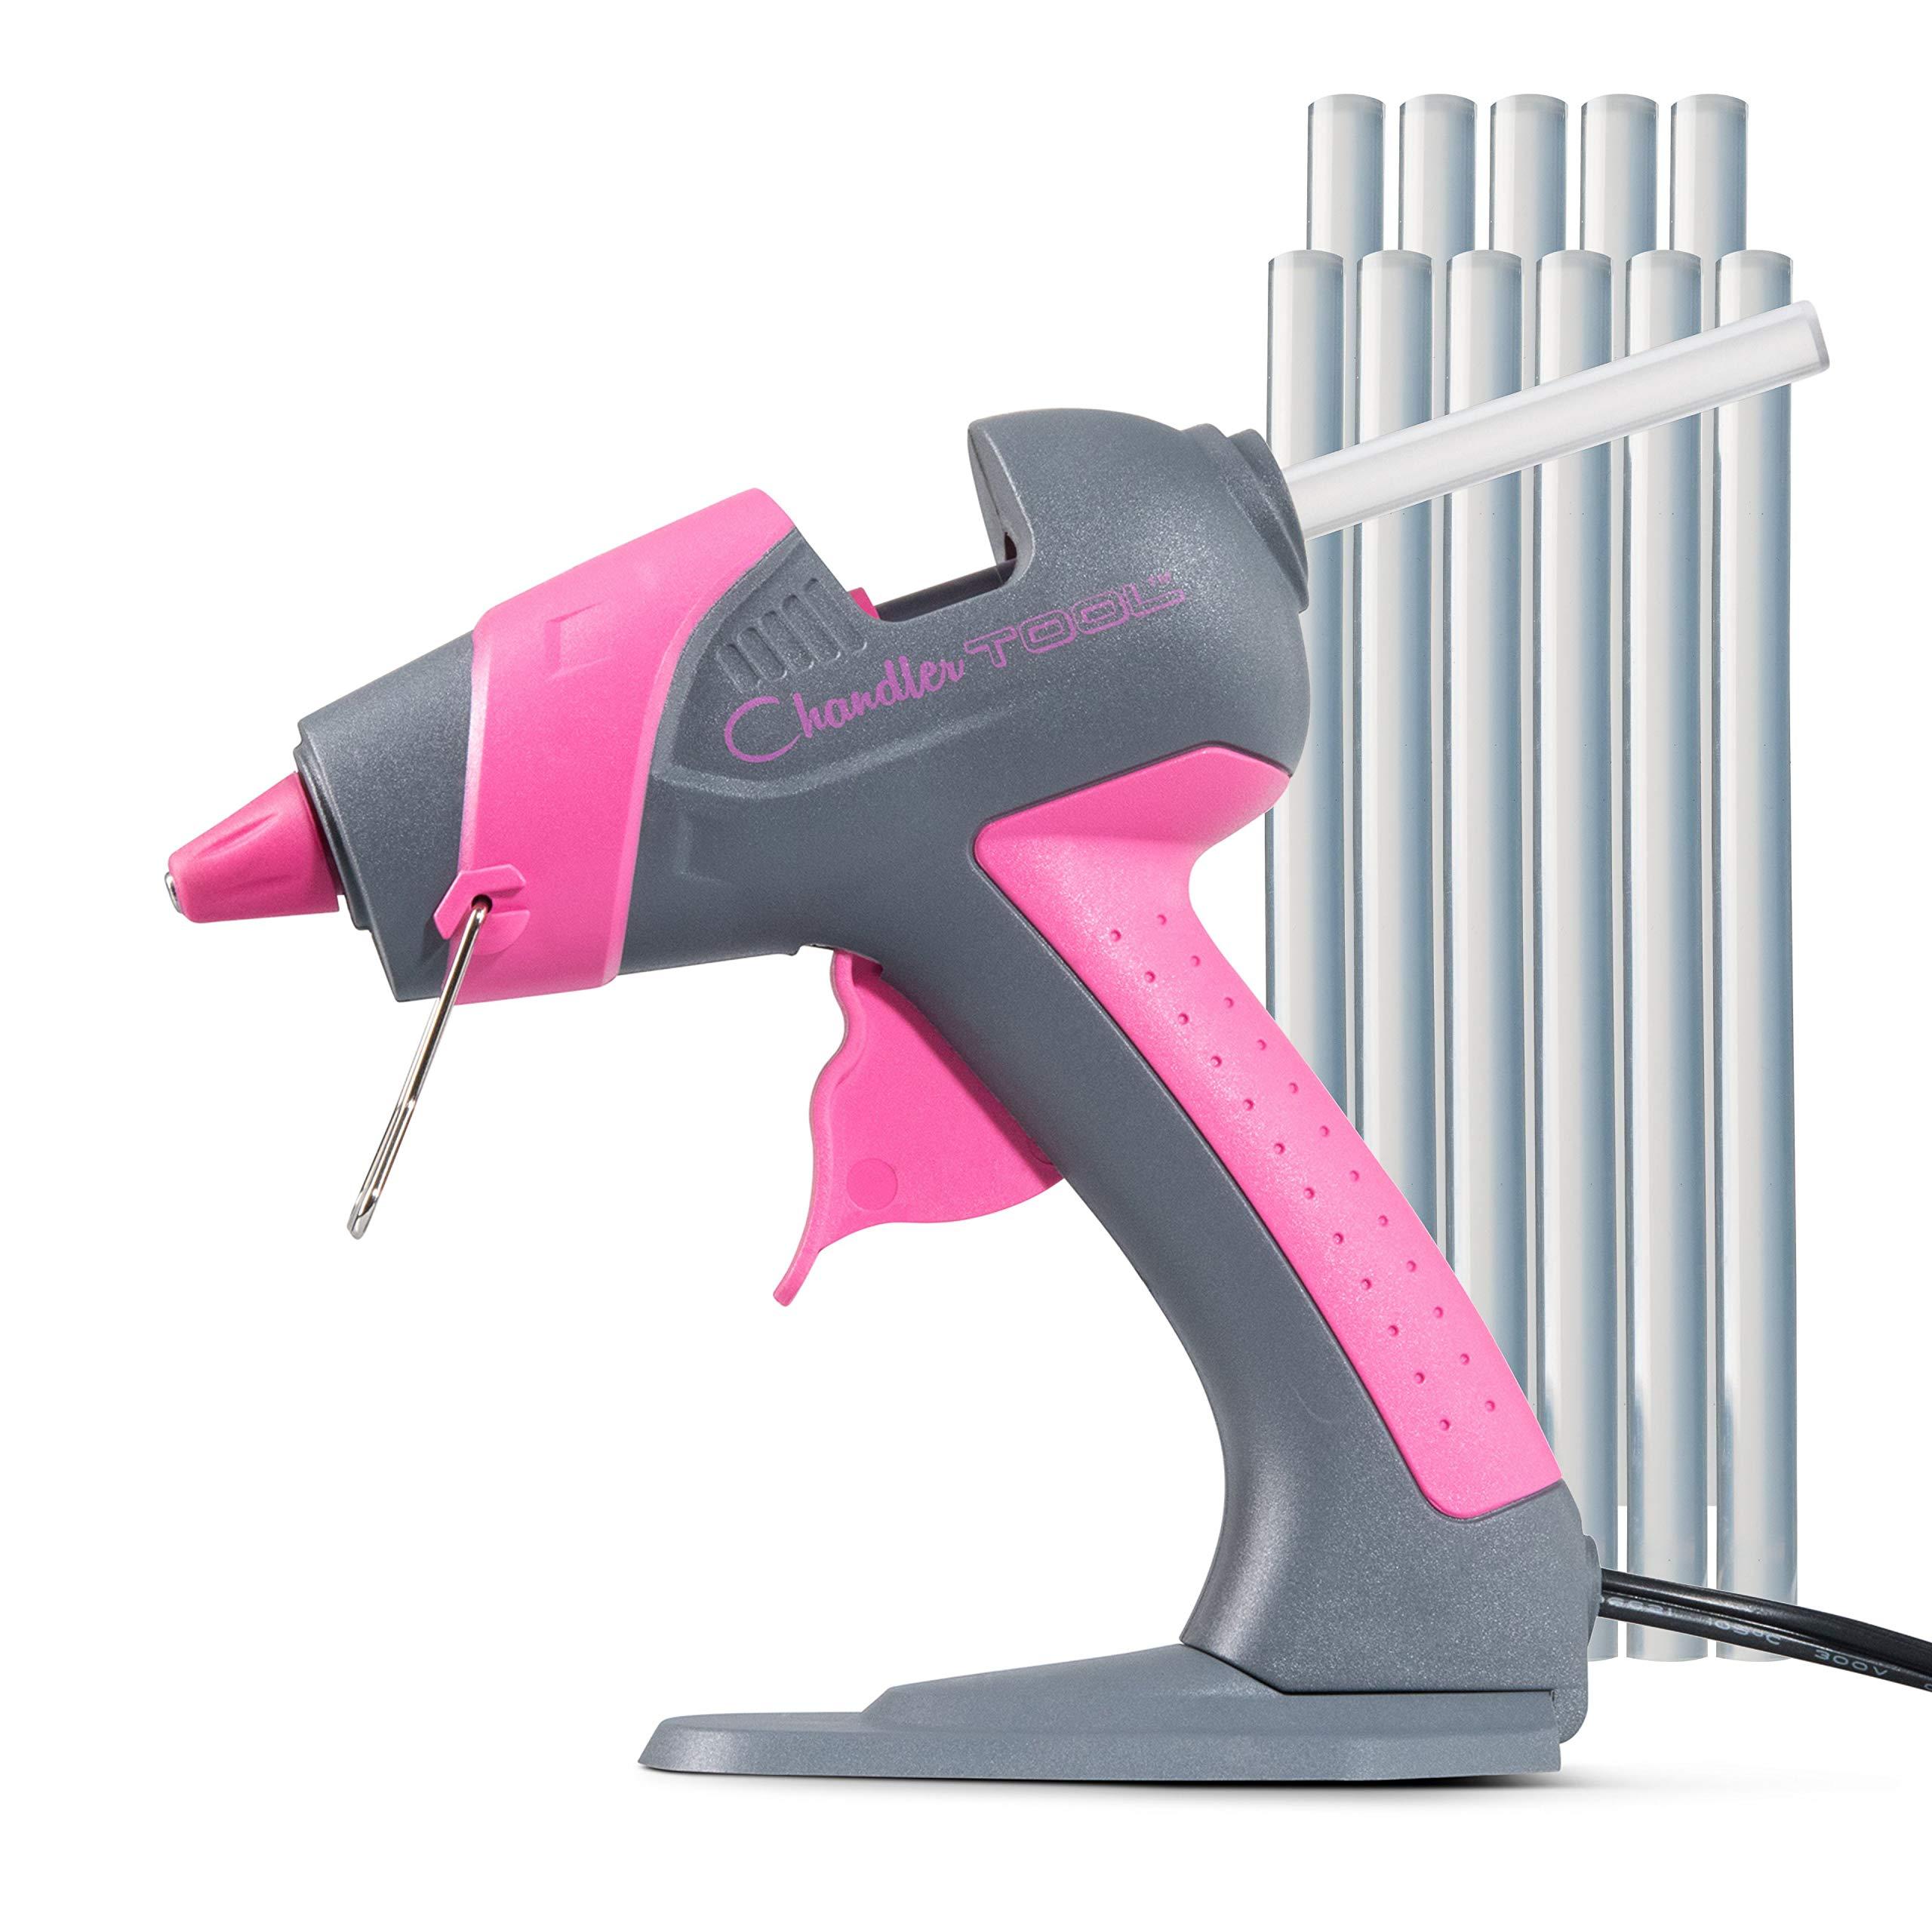 Chandler Tool Mini Glue Gun - 25 Watt - Hot Glue Sticks & Patented Base Stand Included - for Arts Crafts School Home Repair DIY (Pink)